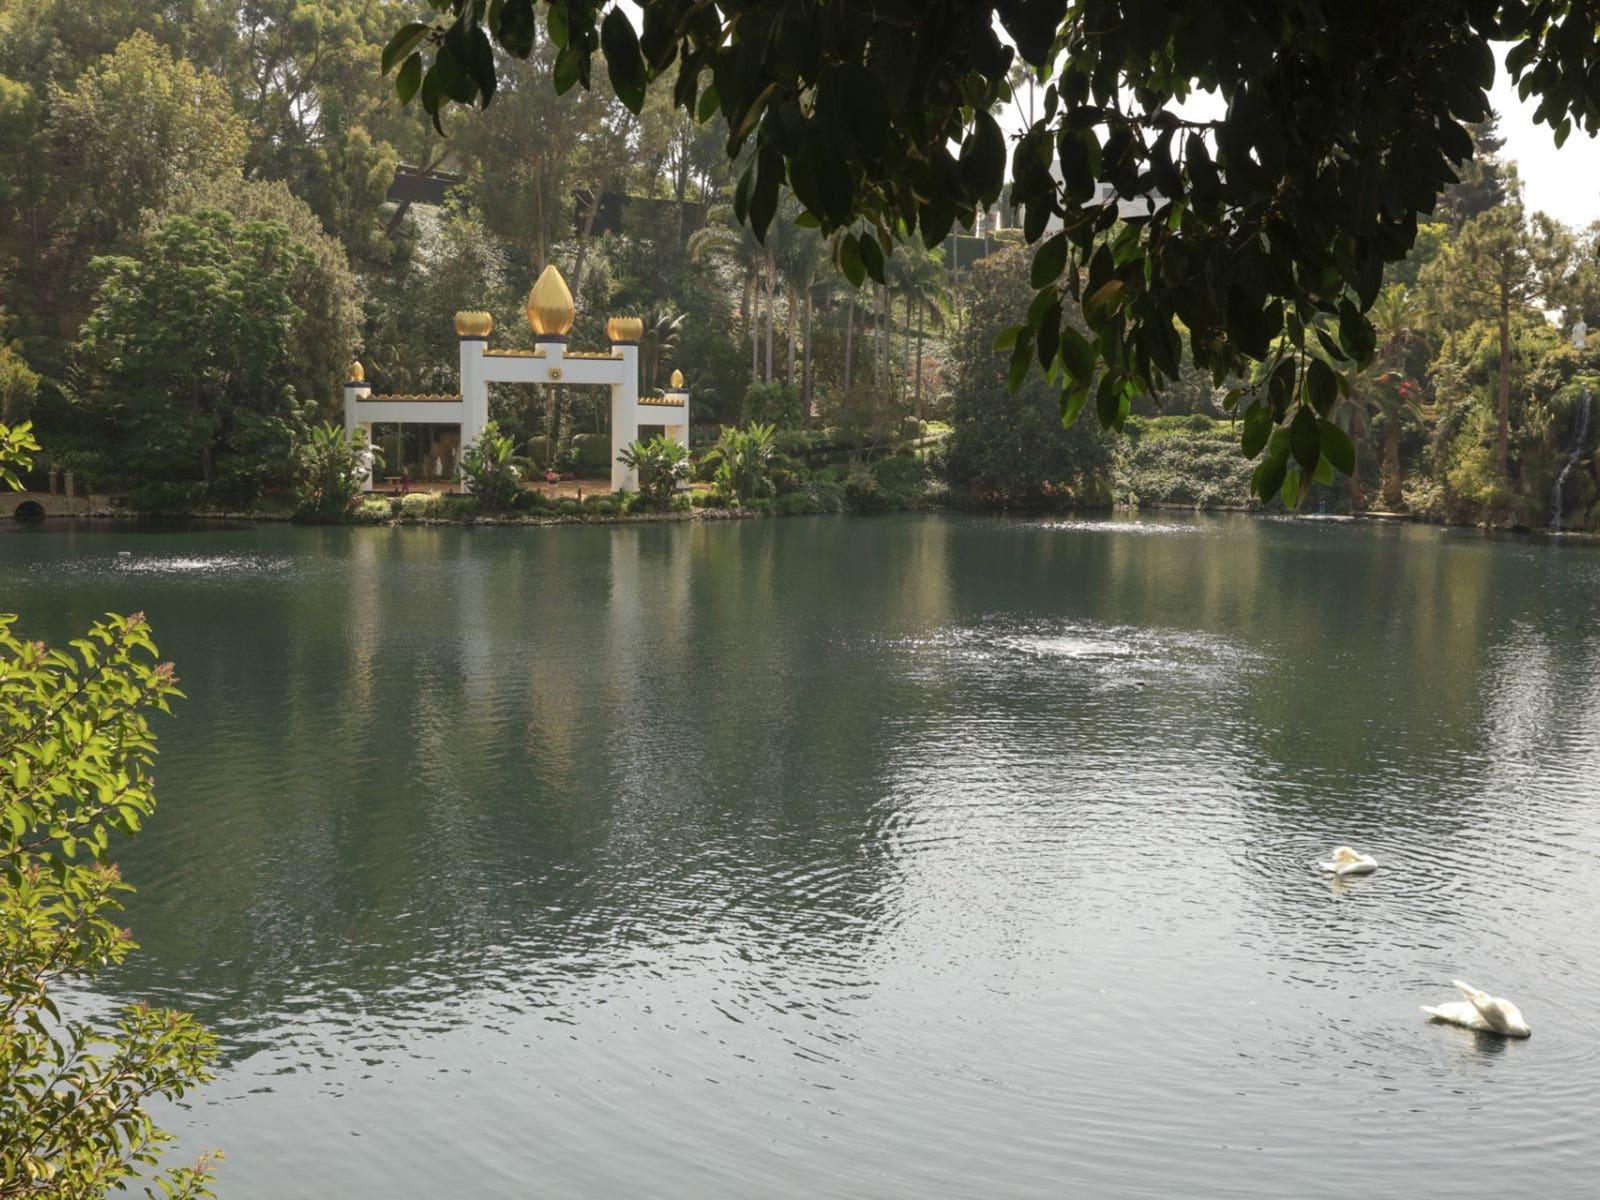 Self-Realization Fellowship Shrine